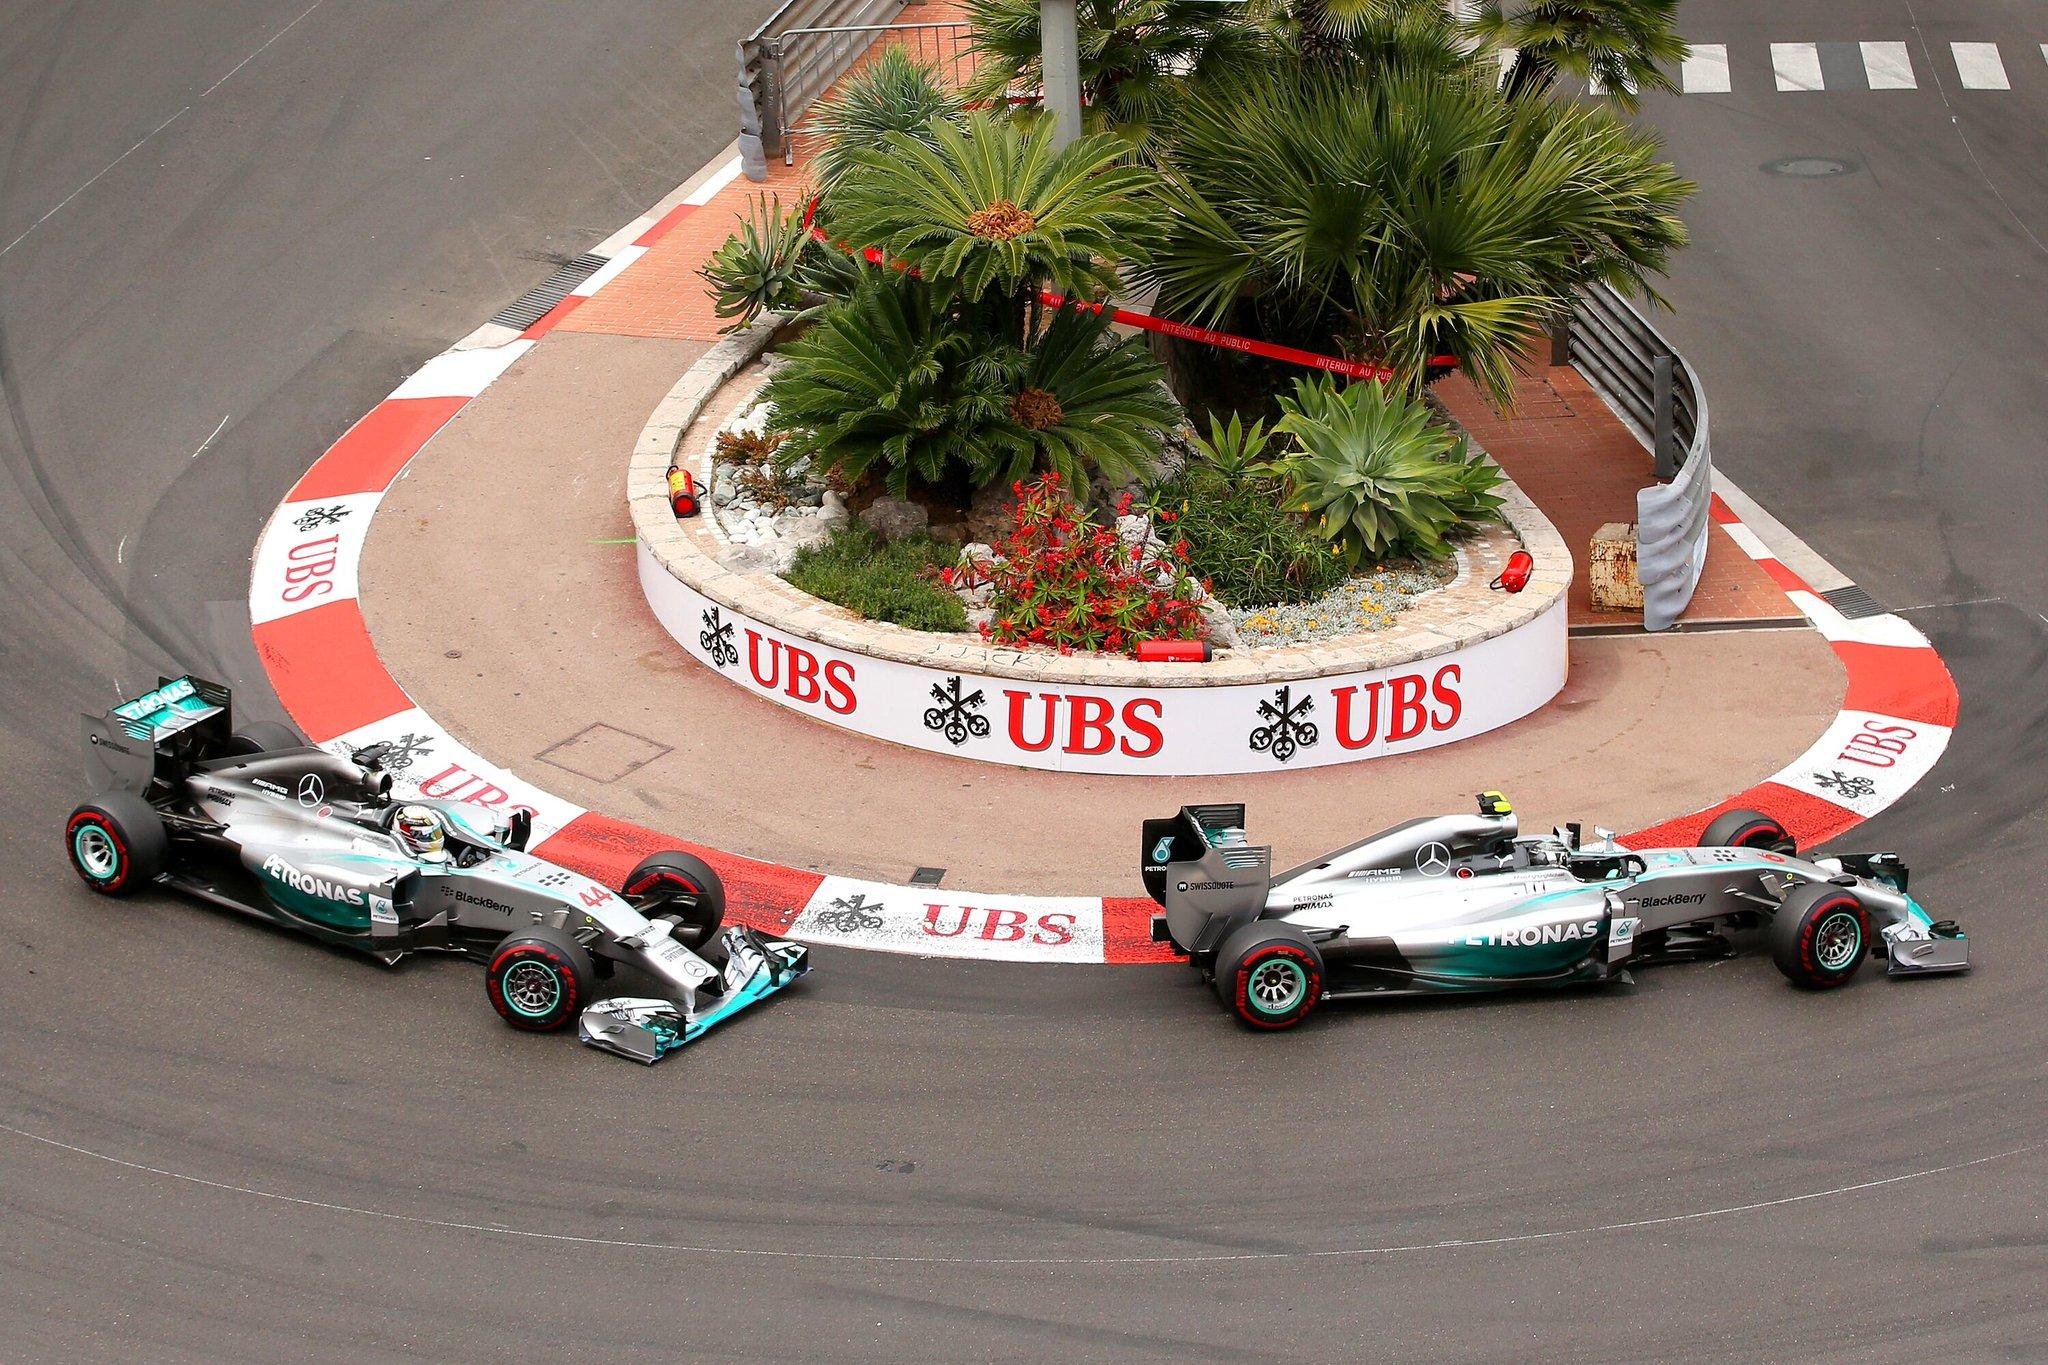 F1: Monaco – Rosberg wins, retakes championship lead